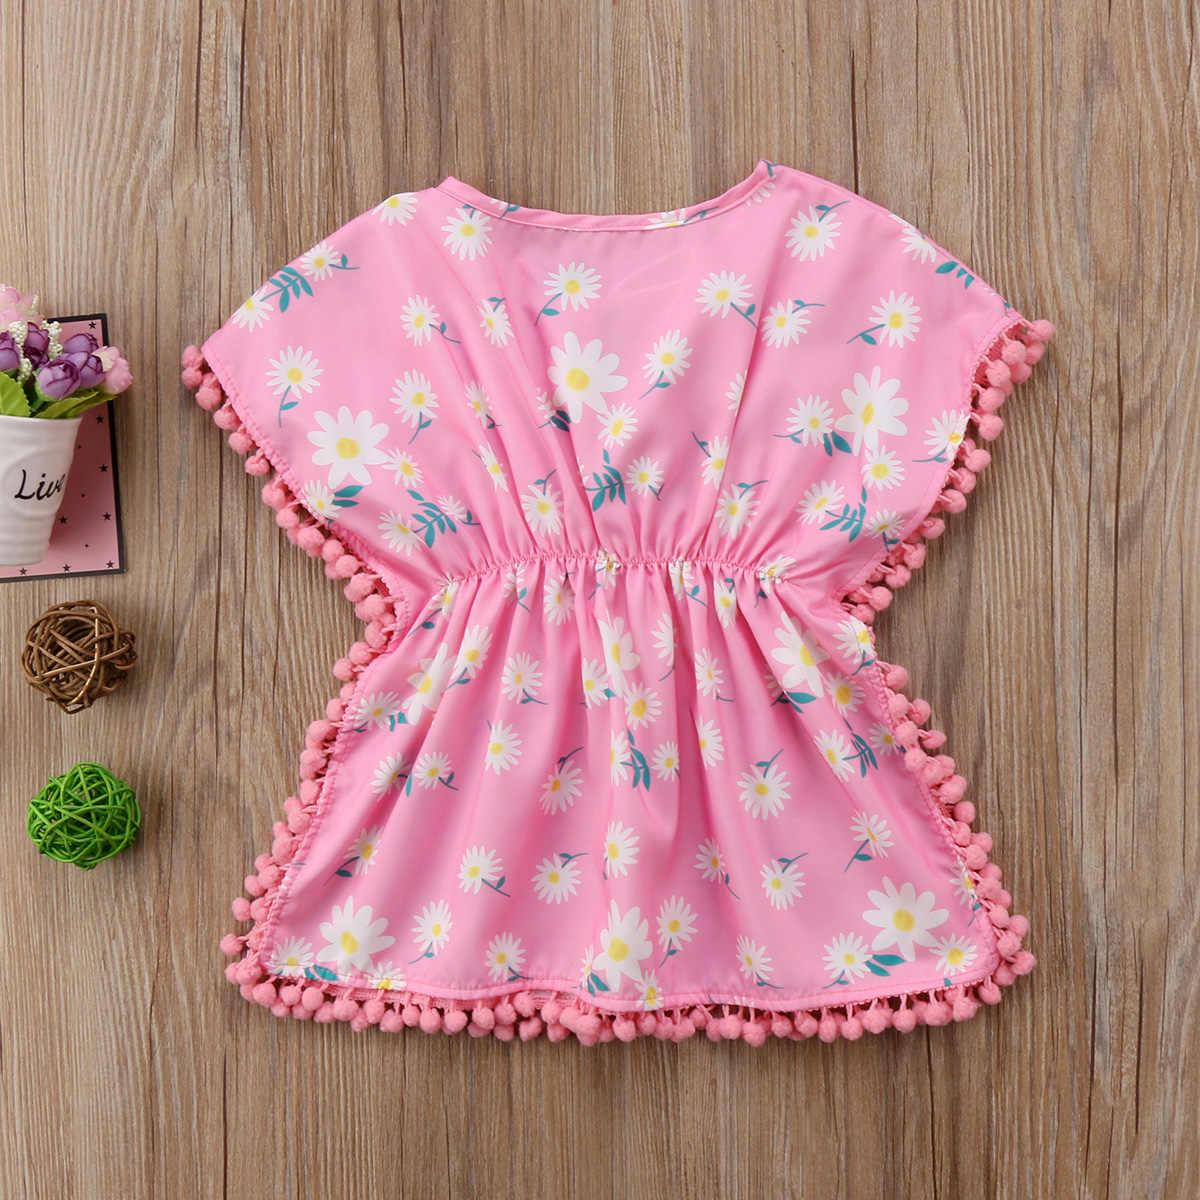 48300047bbac ... Fashion Kids Baby Girls Dress 2018 Floral Pom Pom Beach Dress Sundress  Cute Baby Girls Clothes